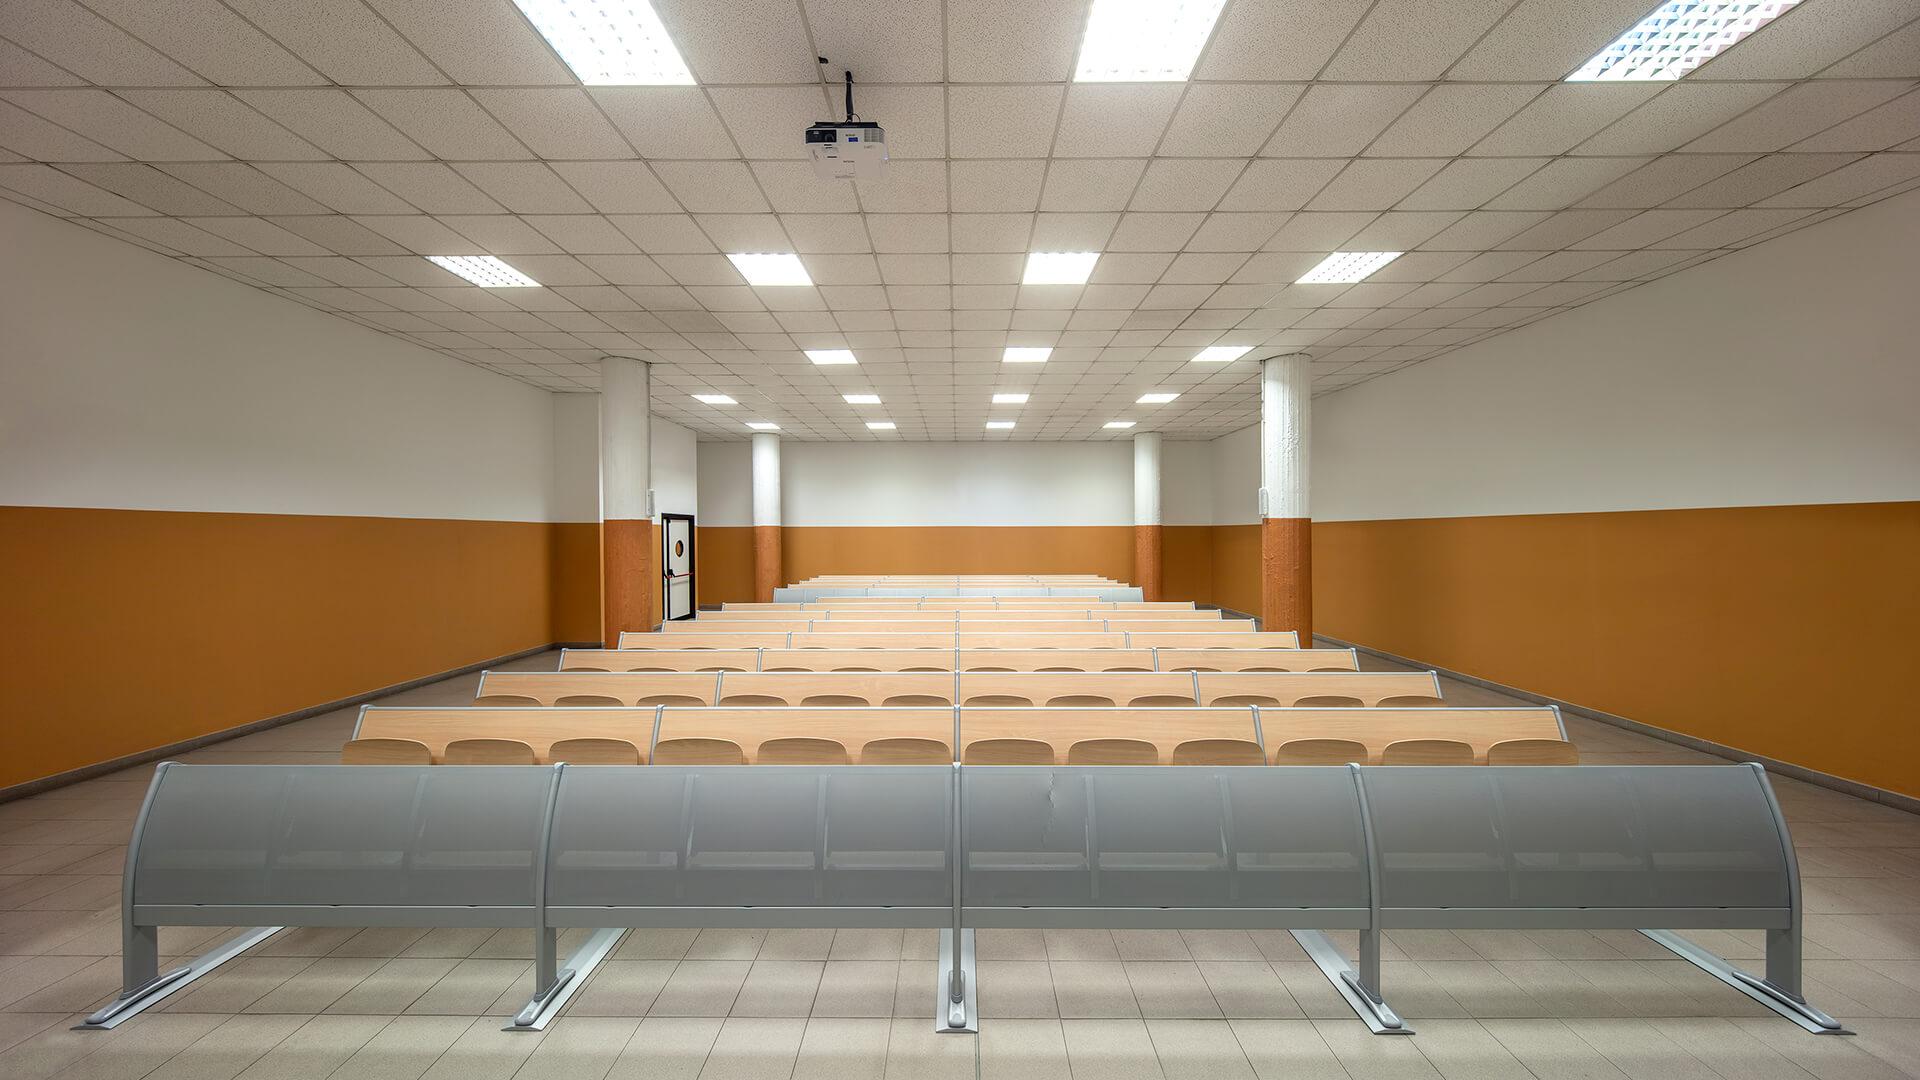 univertsita-studi-di-genova-q3000-study-bench-by-lamm-10